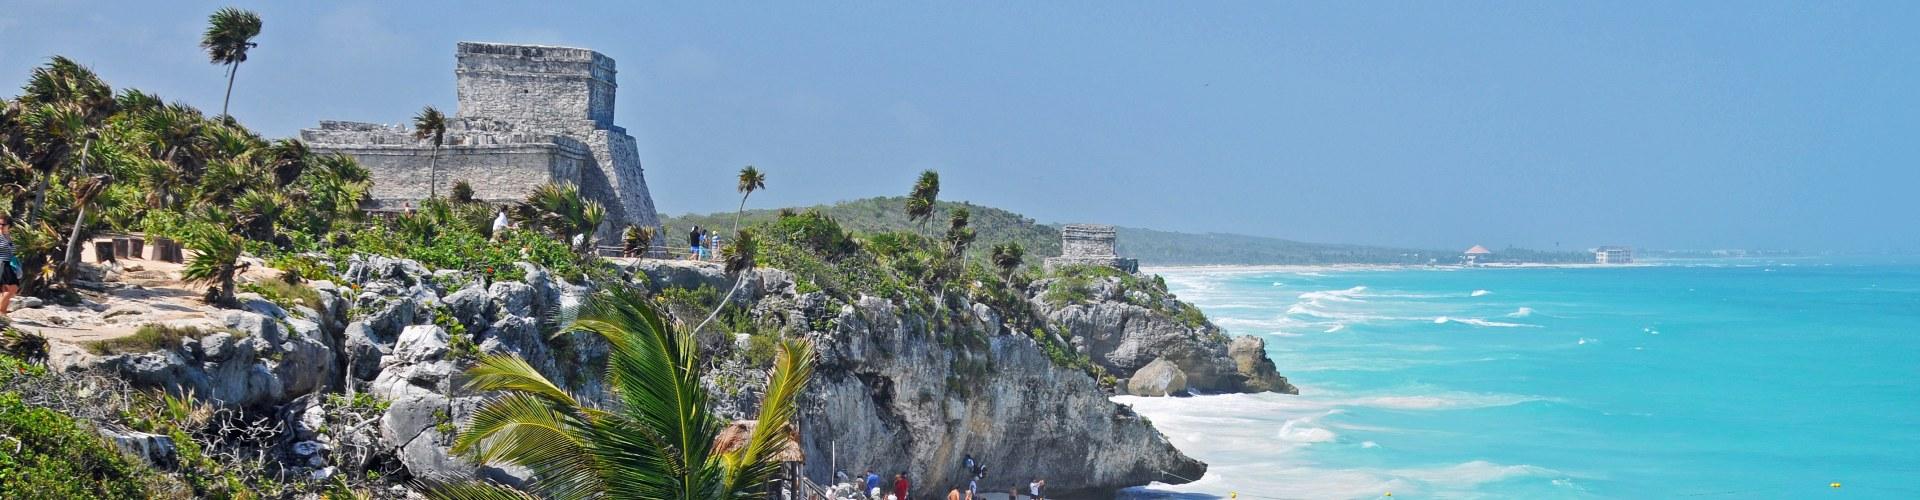 Mexiko Rundreise mit Bavaria Fernreisen